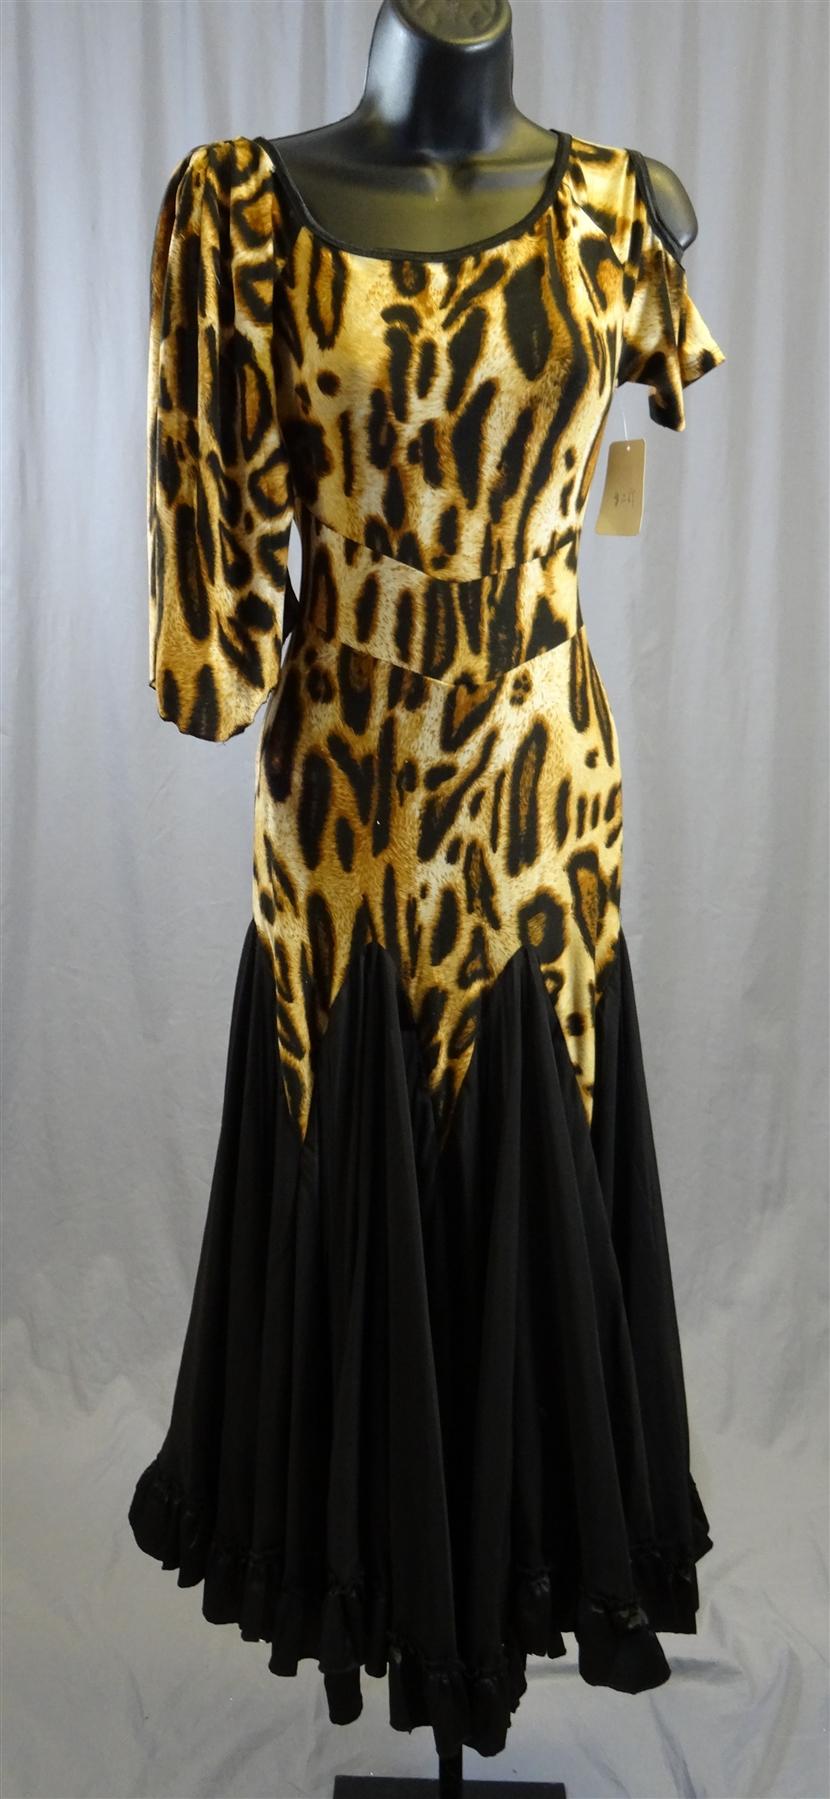 Elegant Leopard Ballroom Dance Dress